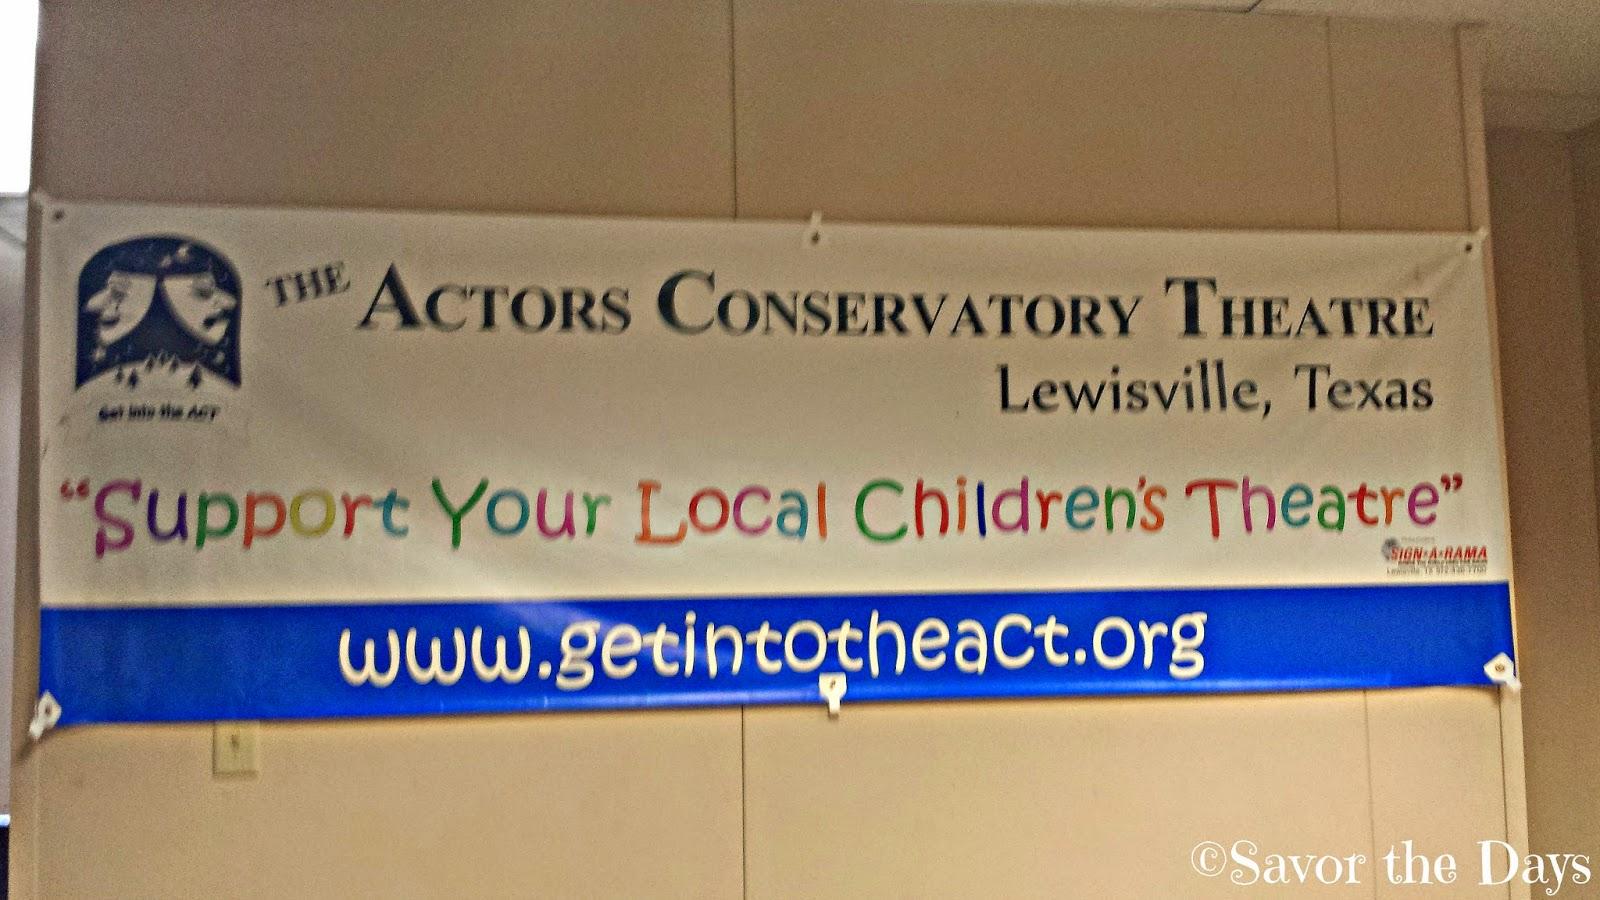 Actors Conservatory Theatre